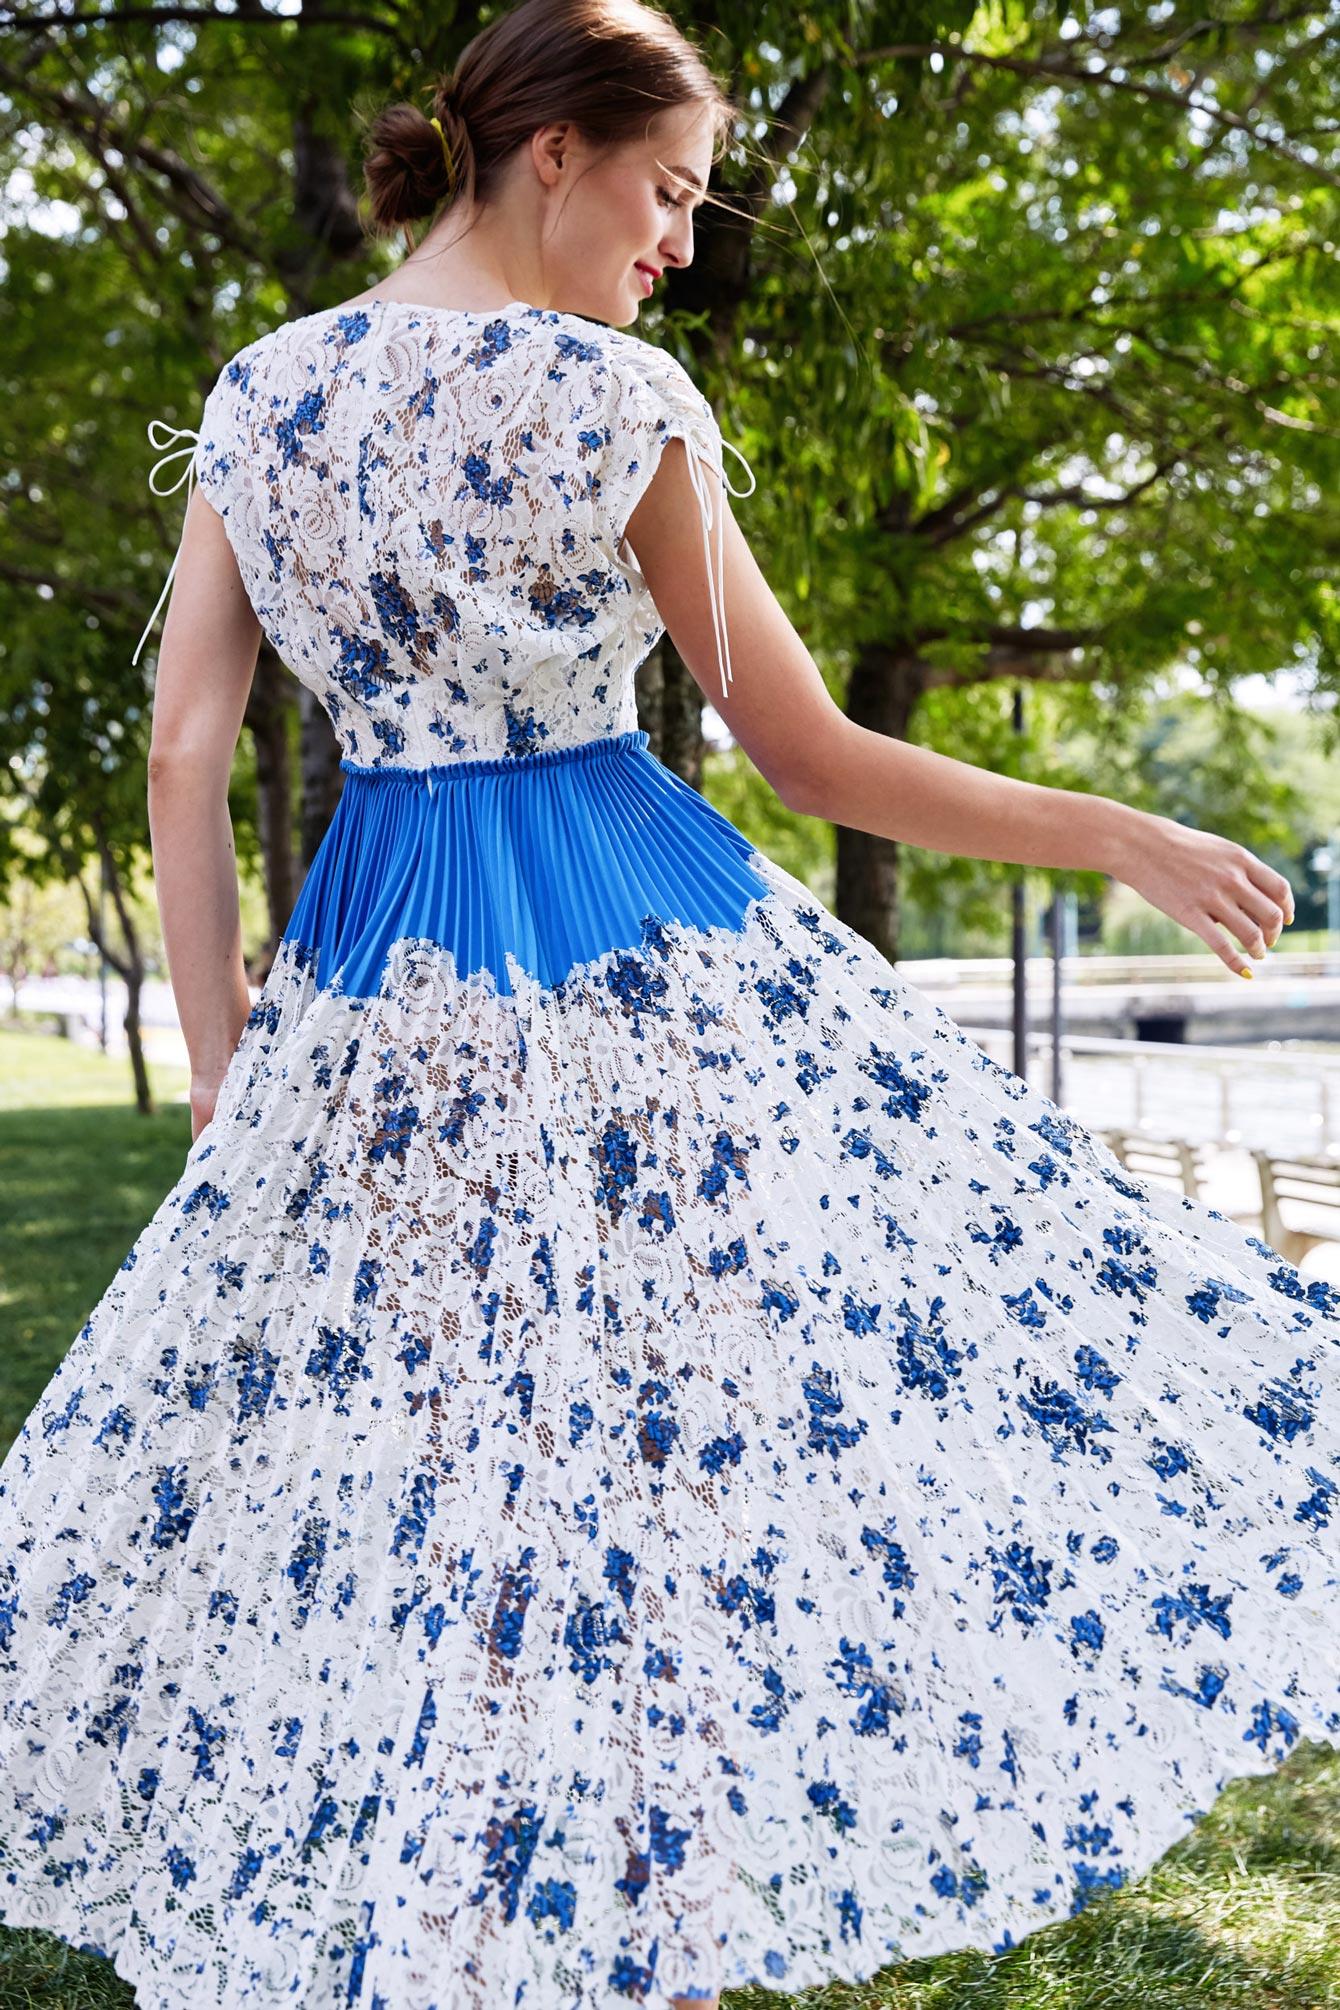 Lela Rose Floral Lace Fit Flare Dress